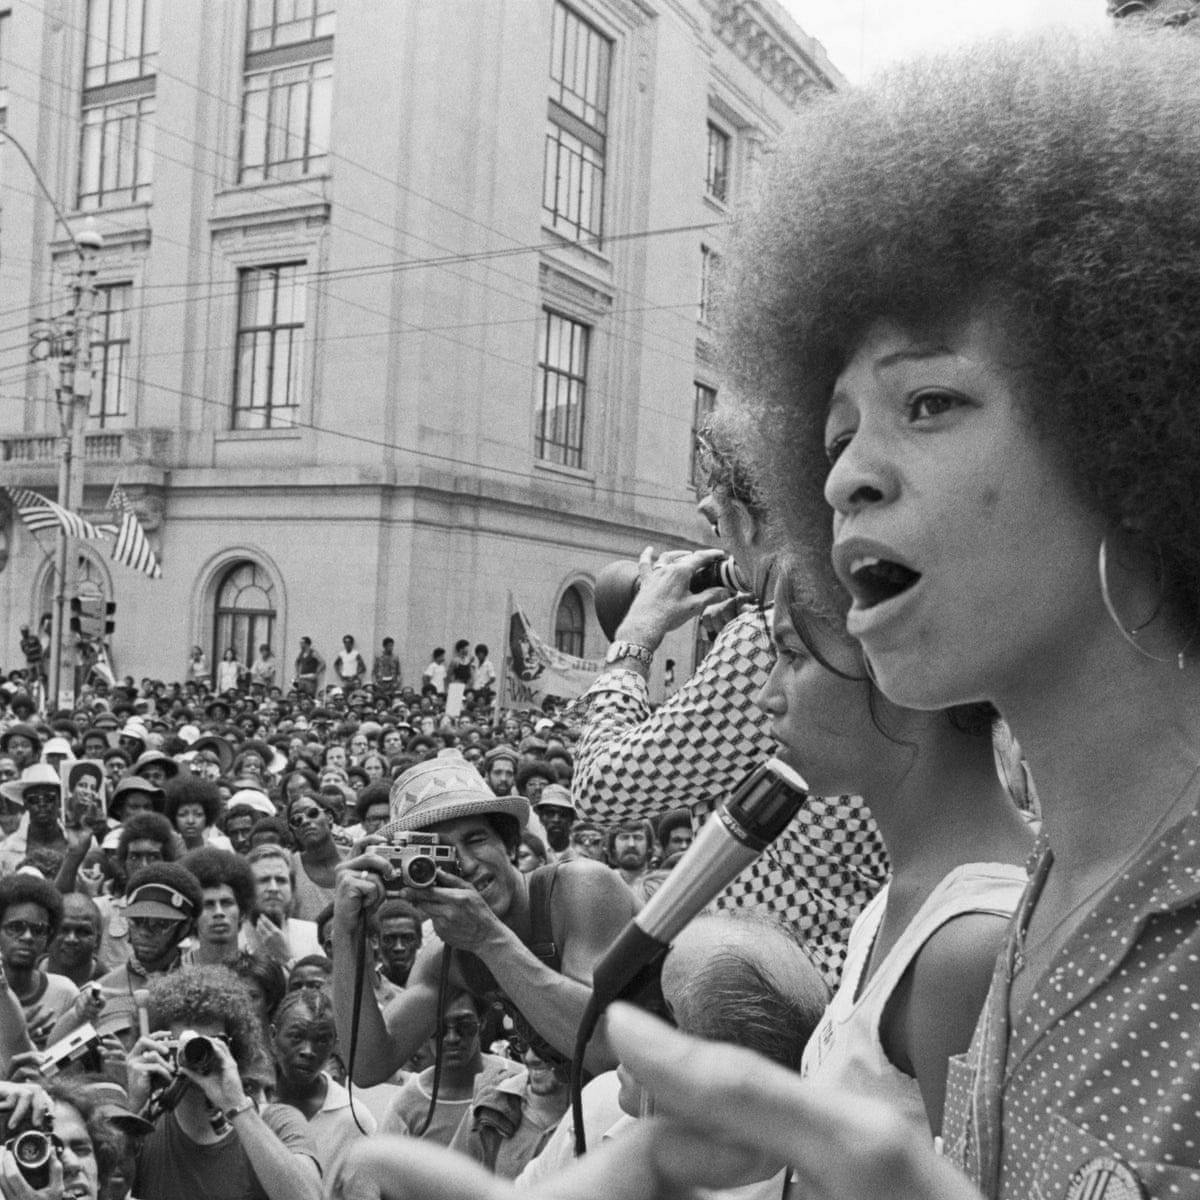 Angela Davis, afroféminisme; afro fem, femme, militante, militant, manifestations